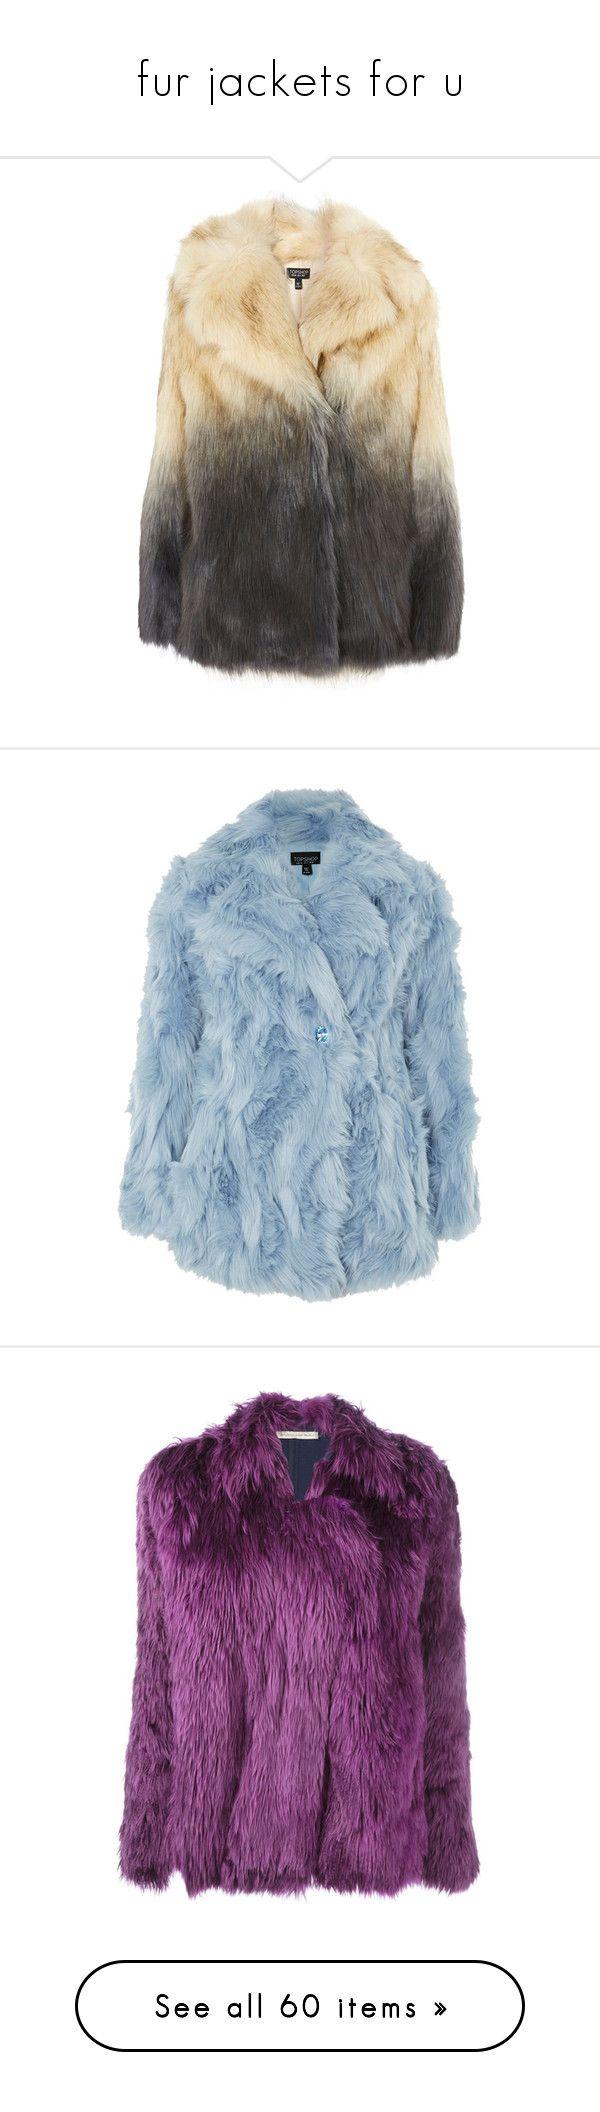 """fur jackets for u"" by evenaka on Polyvore featuring outerwear, coats, teal, teal coat, fake fur coat, retro coat, imitation fur coats, topshop coats, blue and blue coat"